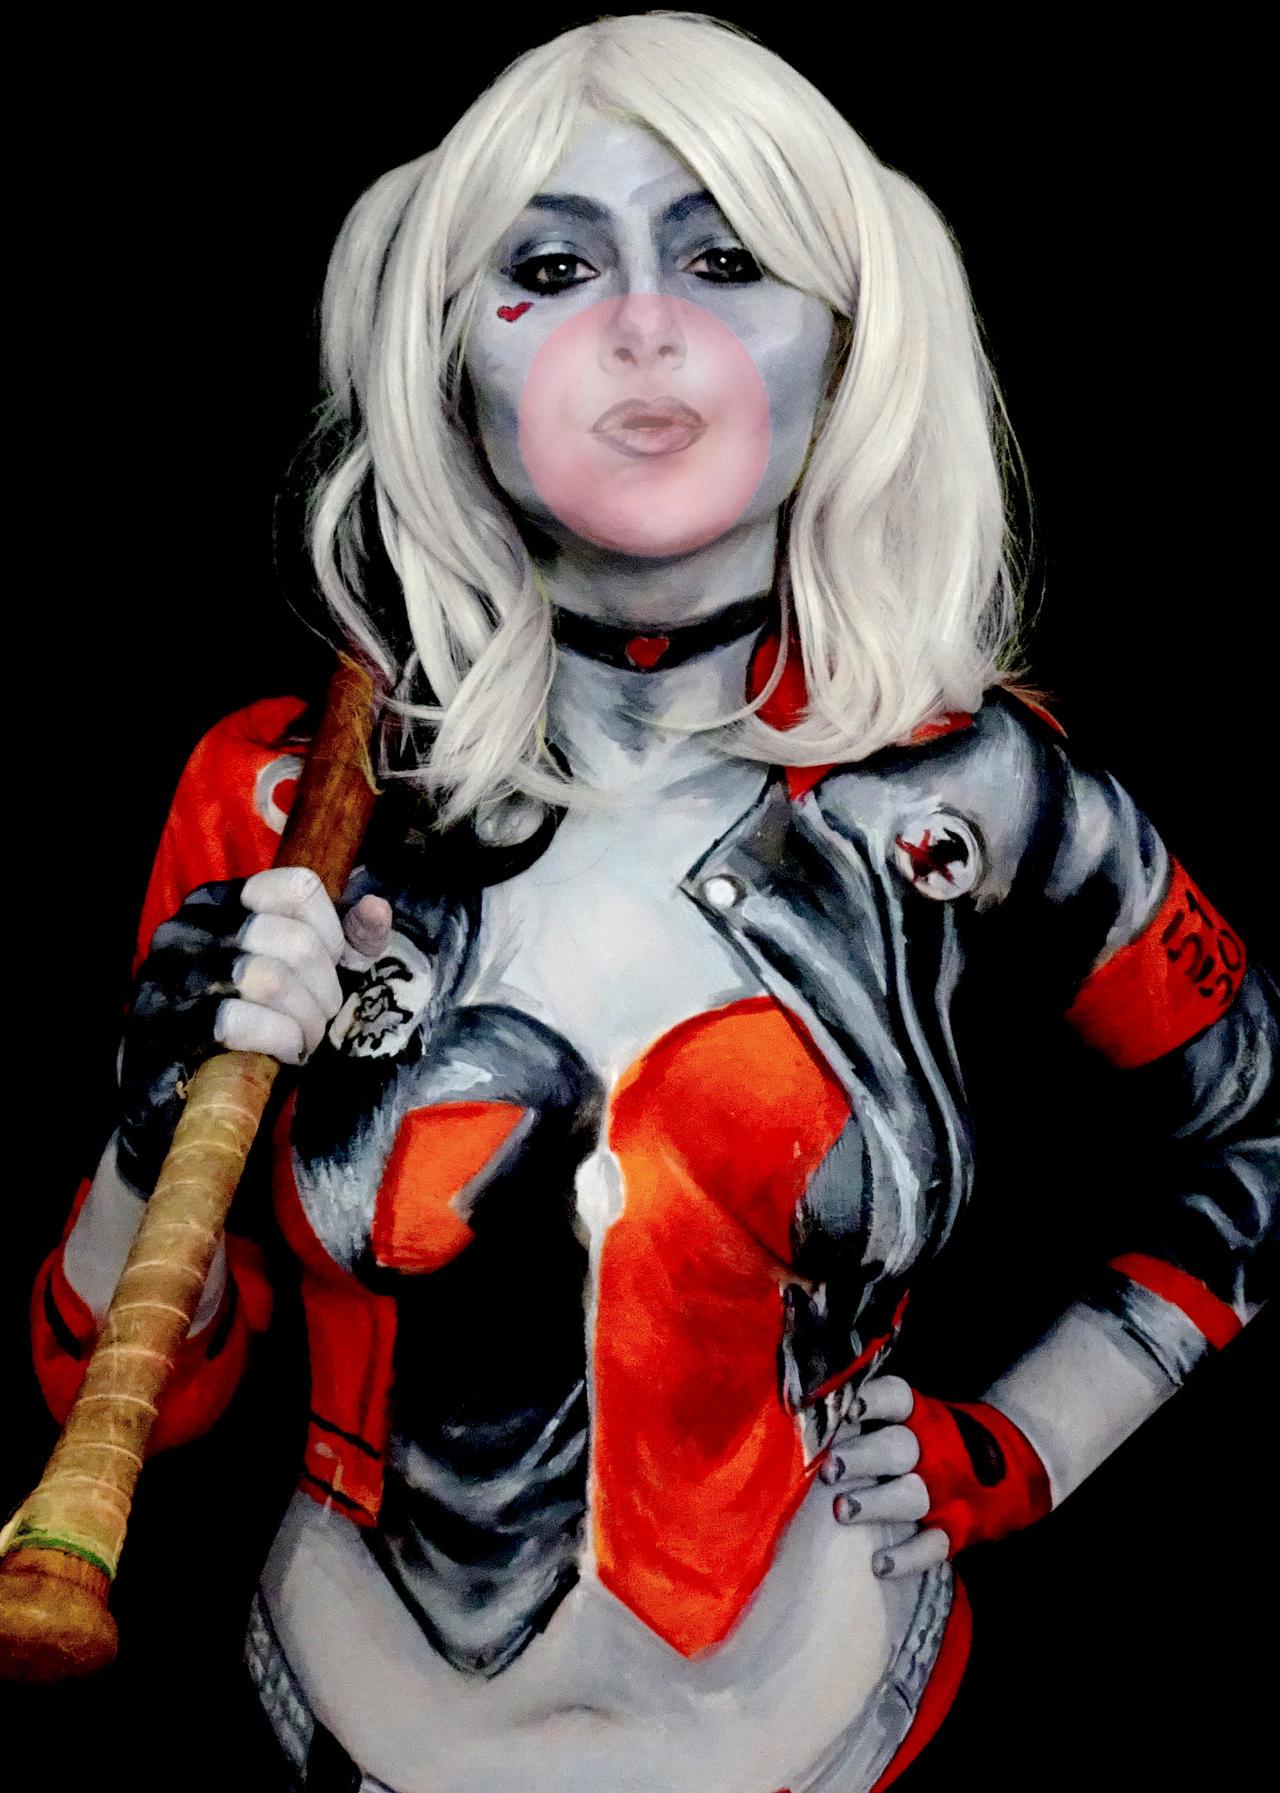 harley quinn sexy cosplay dc comics body paint